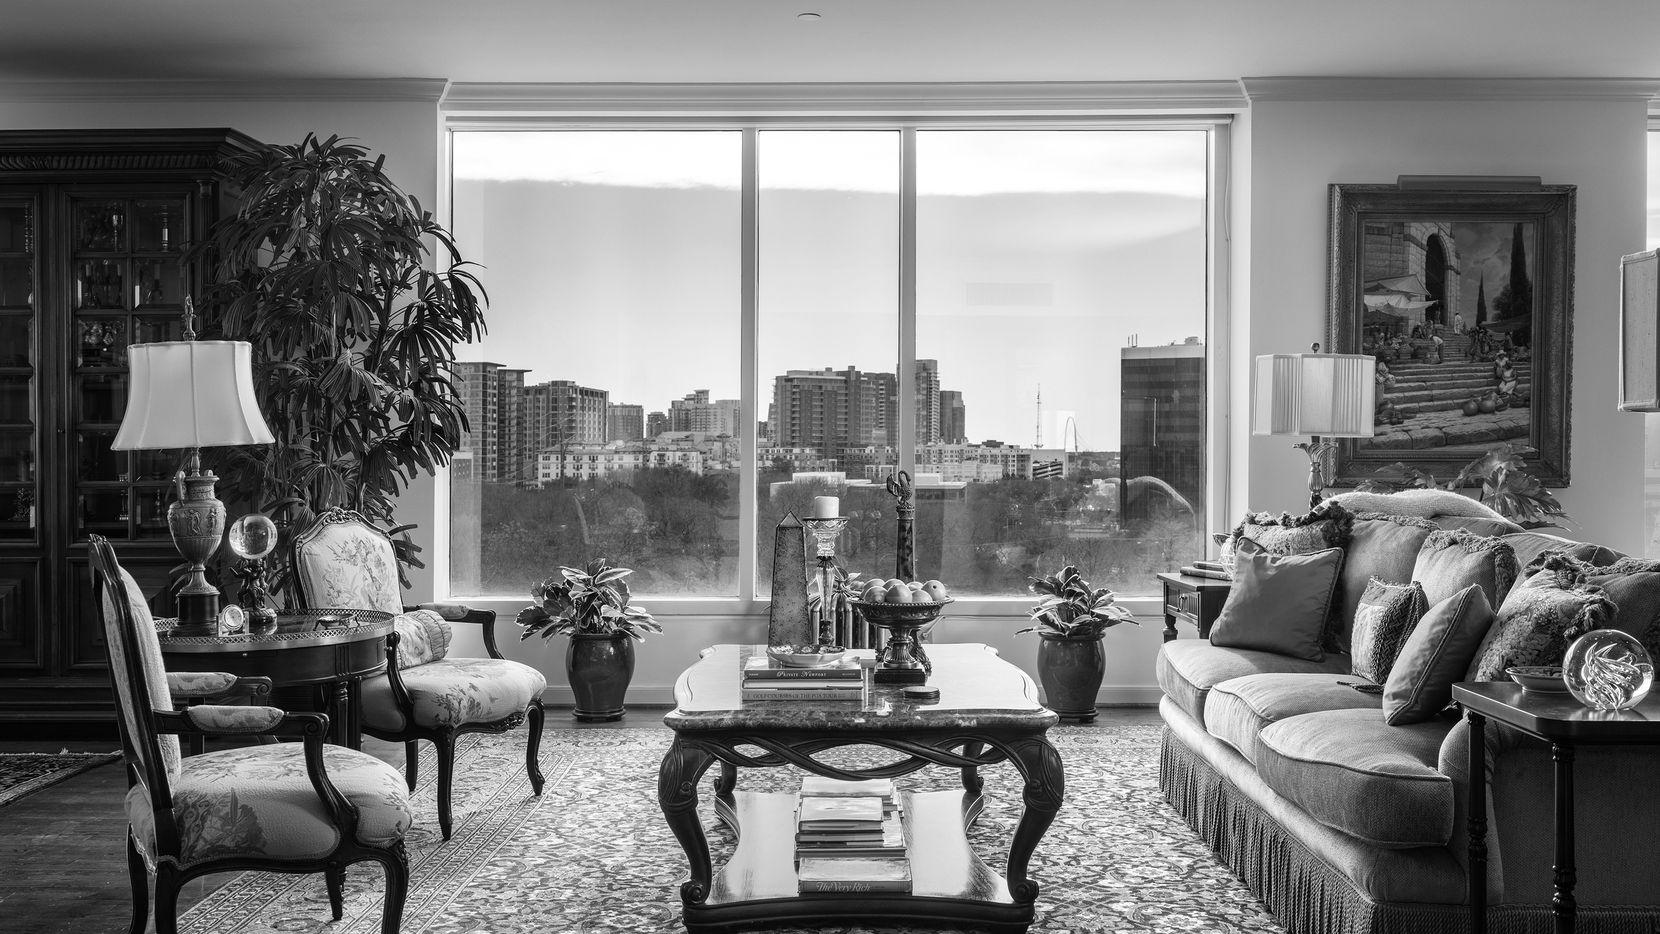 Susan Bradley of Allie Beth Allman & Associates is offering Unit 5E at the Claridge Condominiums, 3510 Turtle Creek, for $850,000.